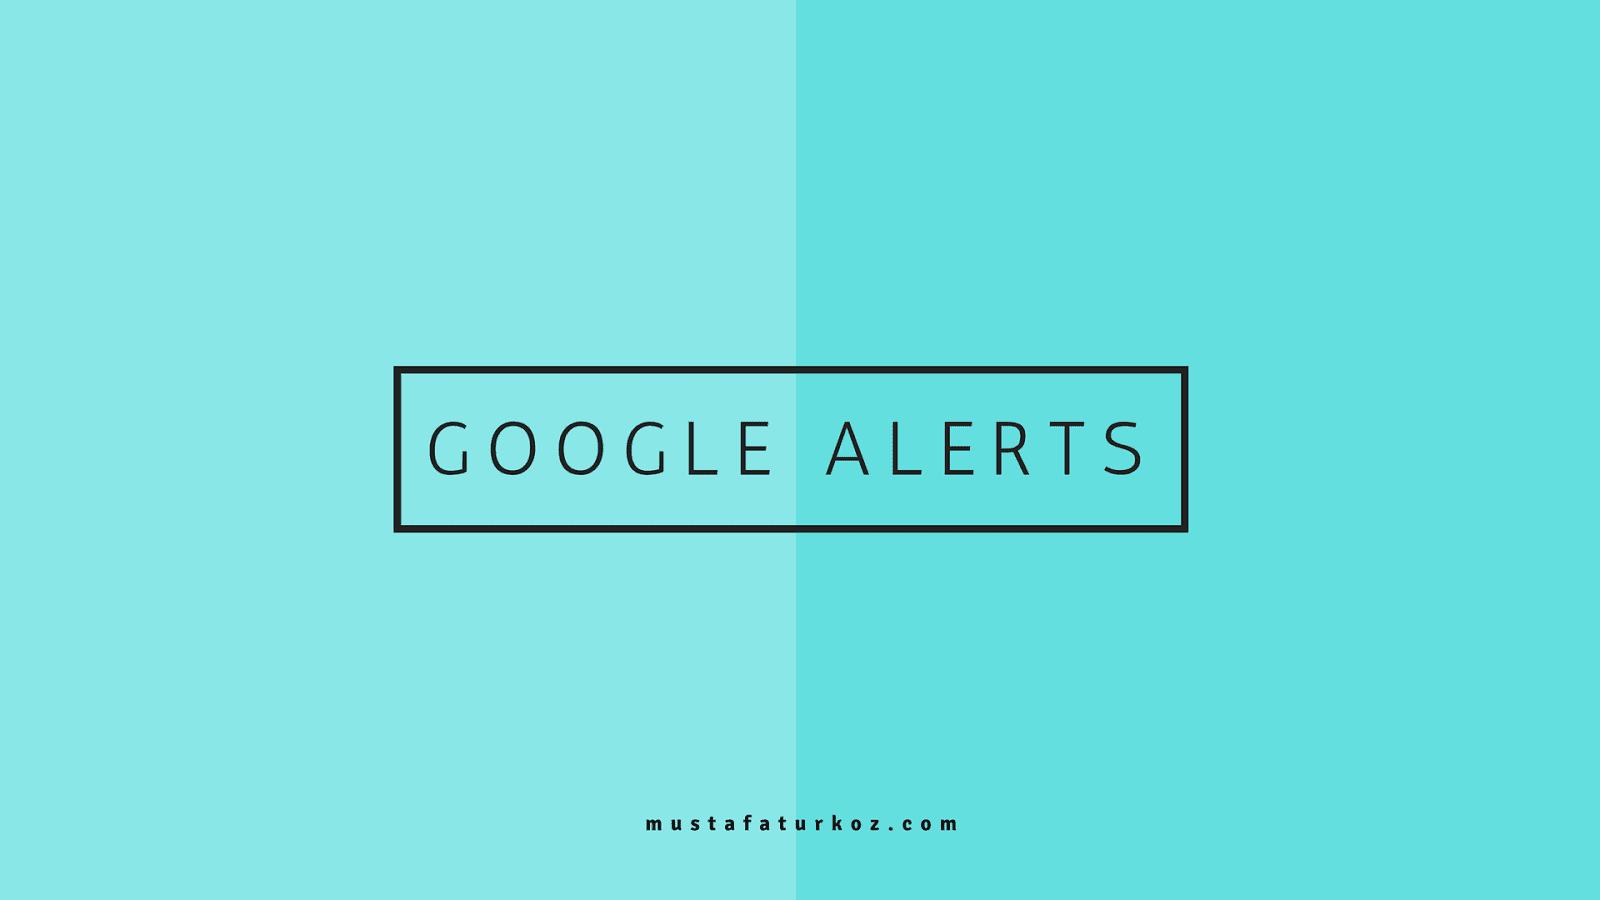 Google Alerts mustafaturkoz.com